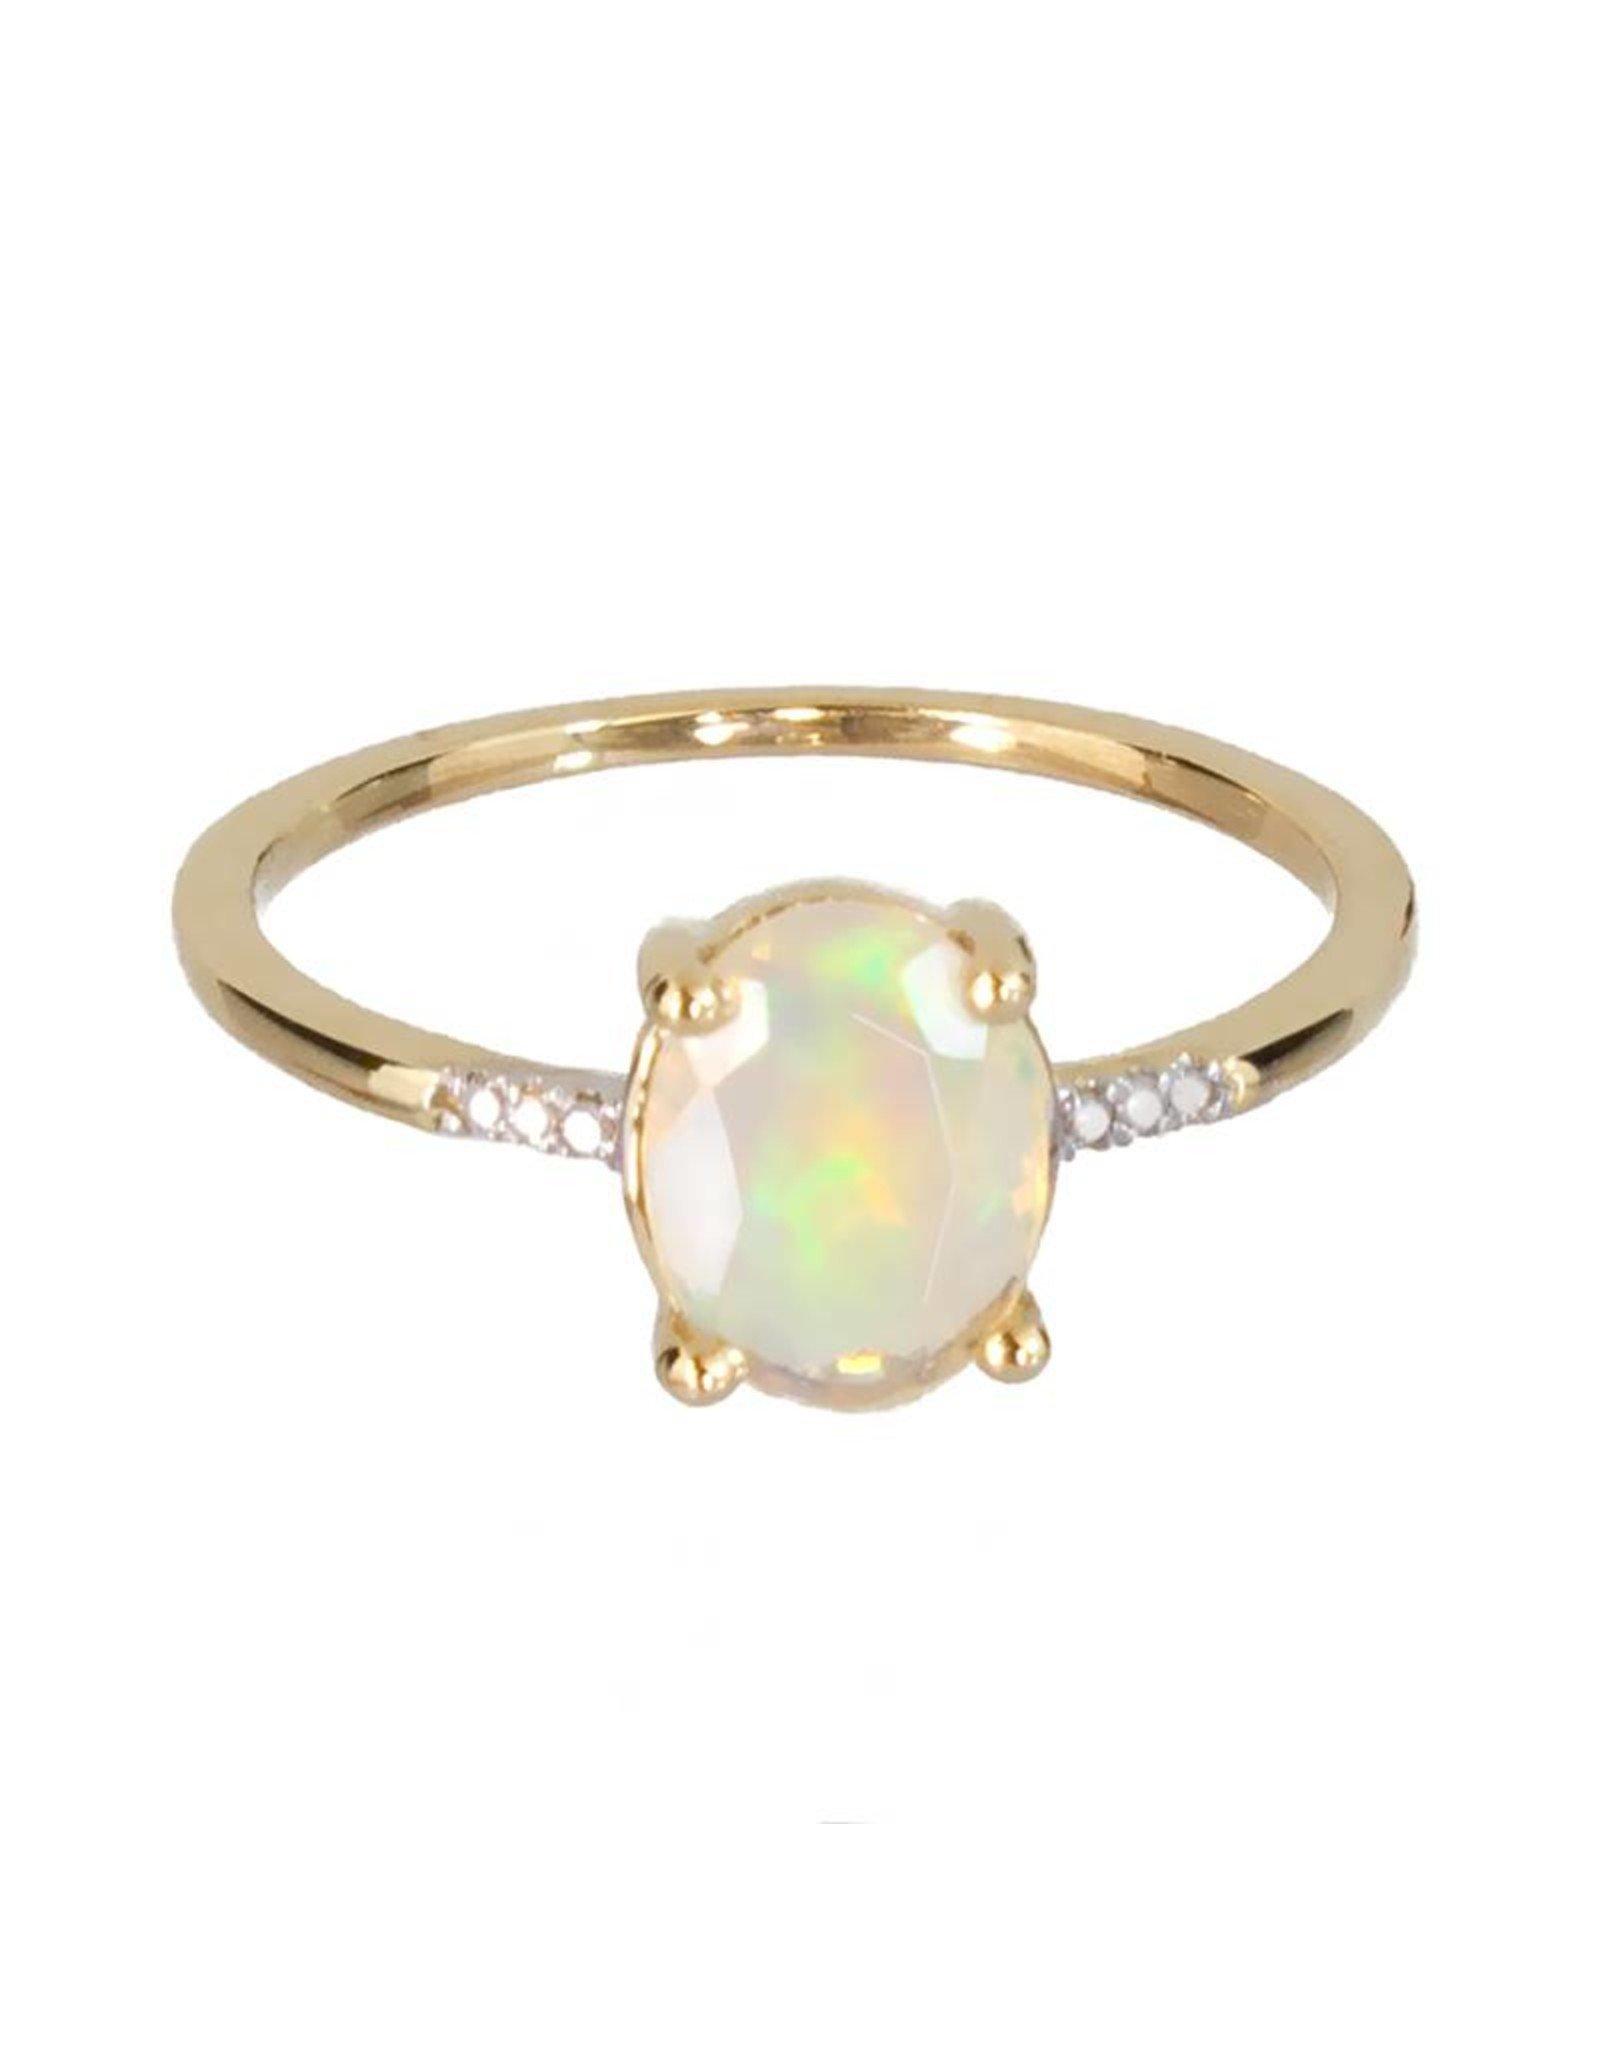 Bo Gold Ring - Gold - Opal